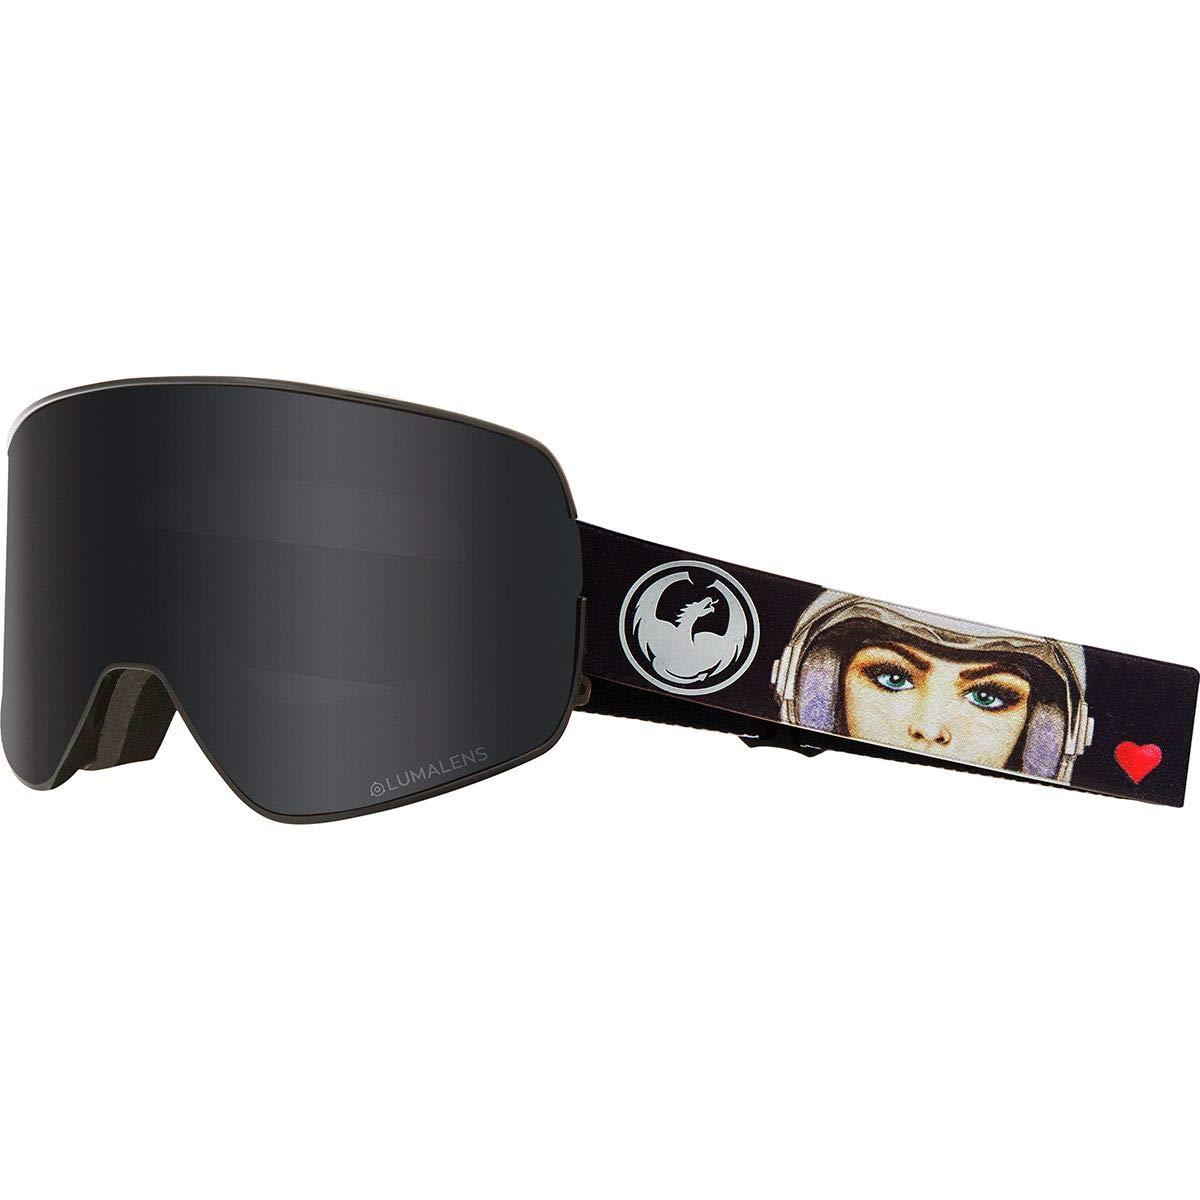 0dca3229f88c Amazon.com   Dragon NFX2 Signature Series Goggles - Men s Blake Paul  Sig Dark Smoke Plus Lum Rose